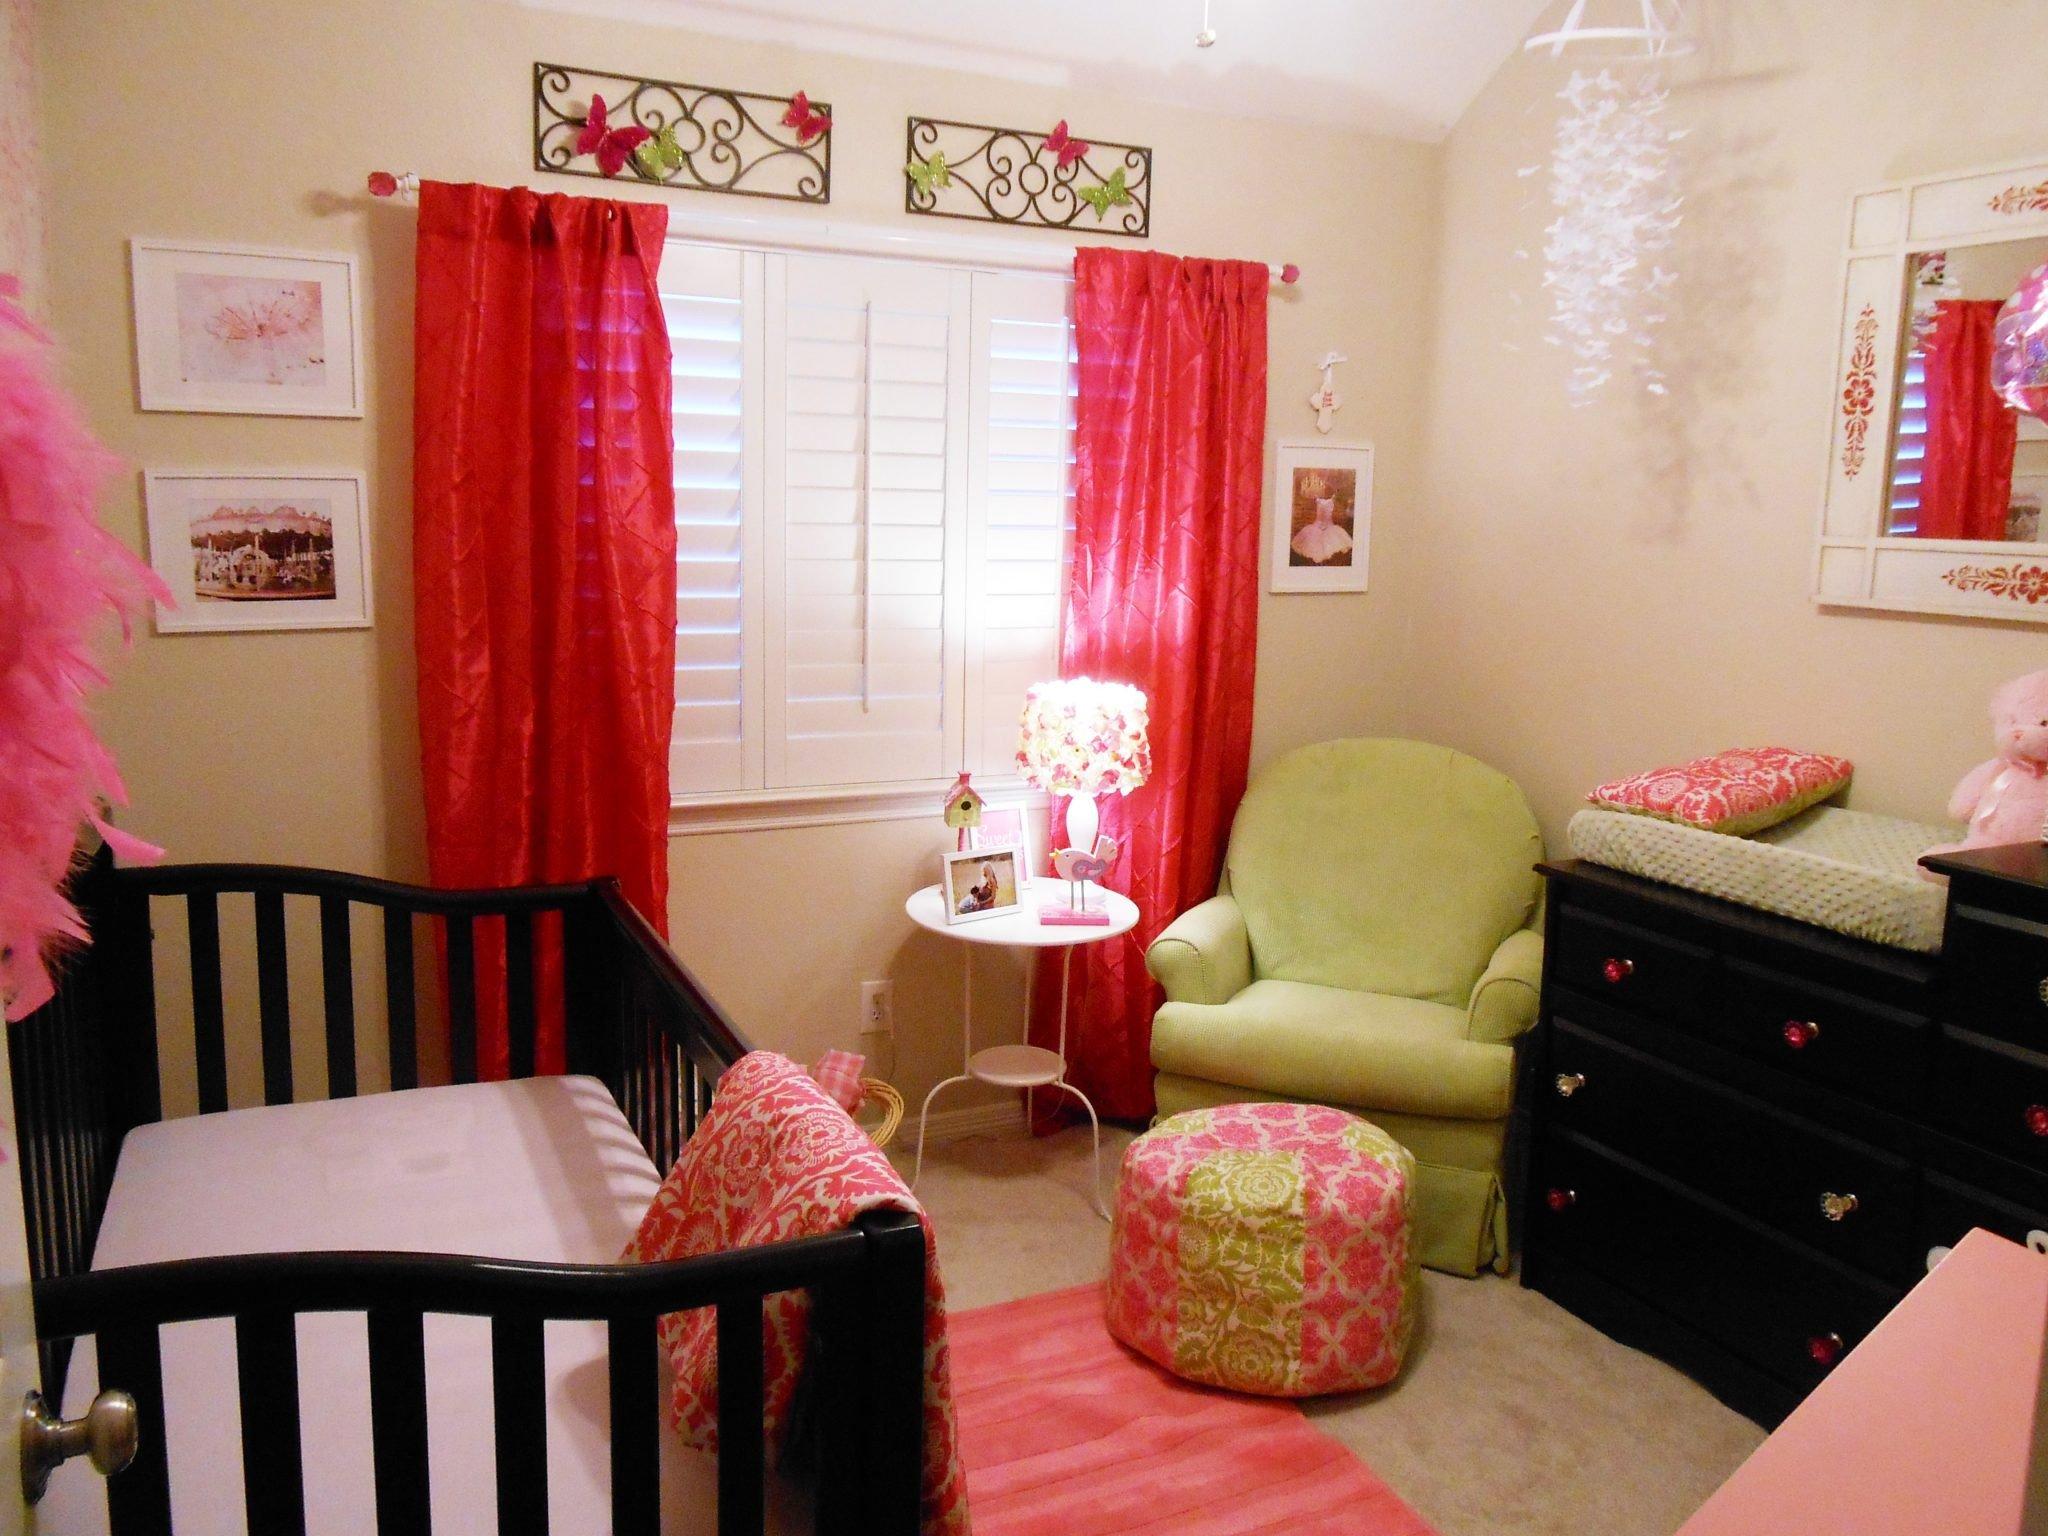 Toddler Girls Room Decor Ideas Inspirational Striking Tips On Decorating Room for toddler Girls